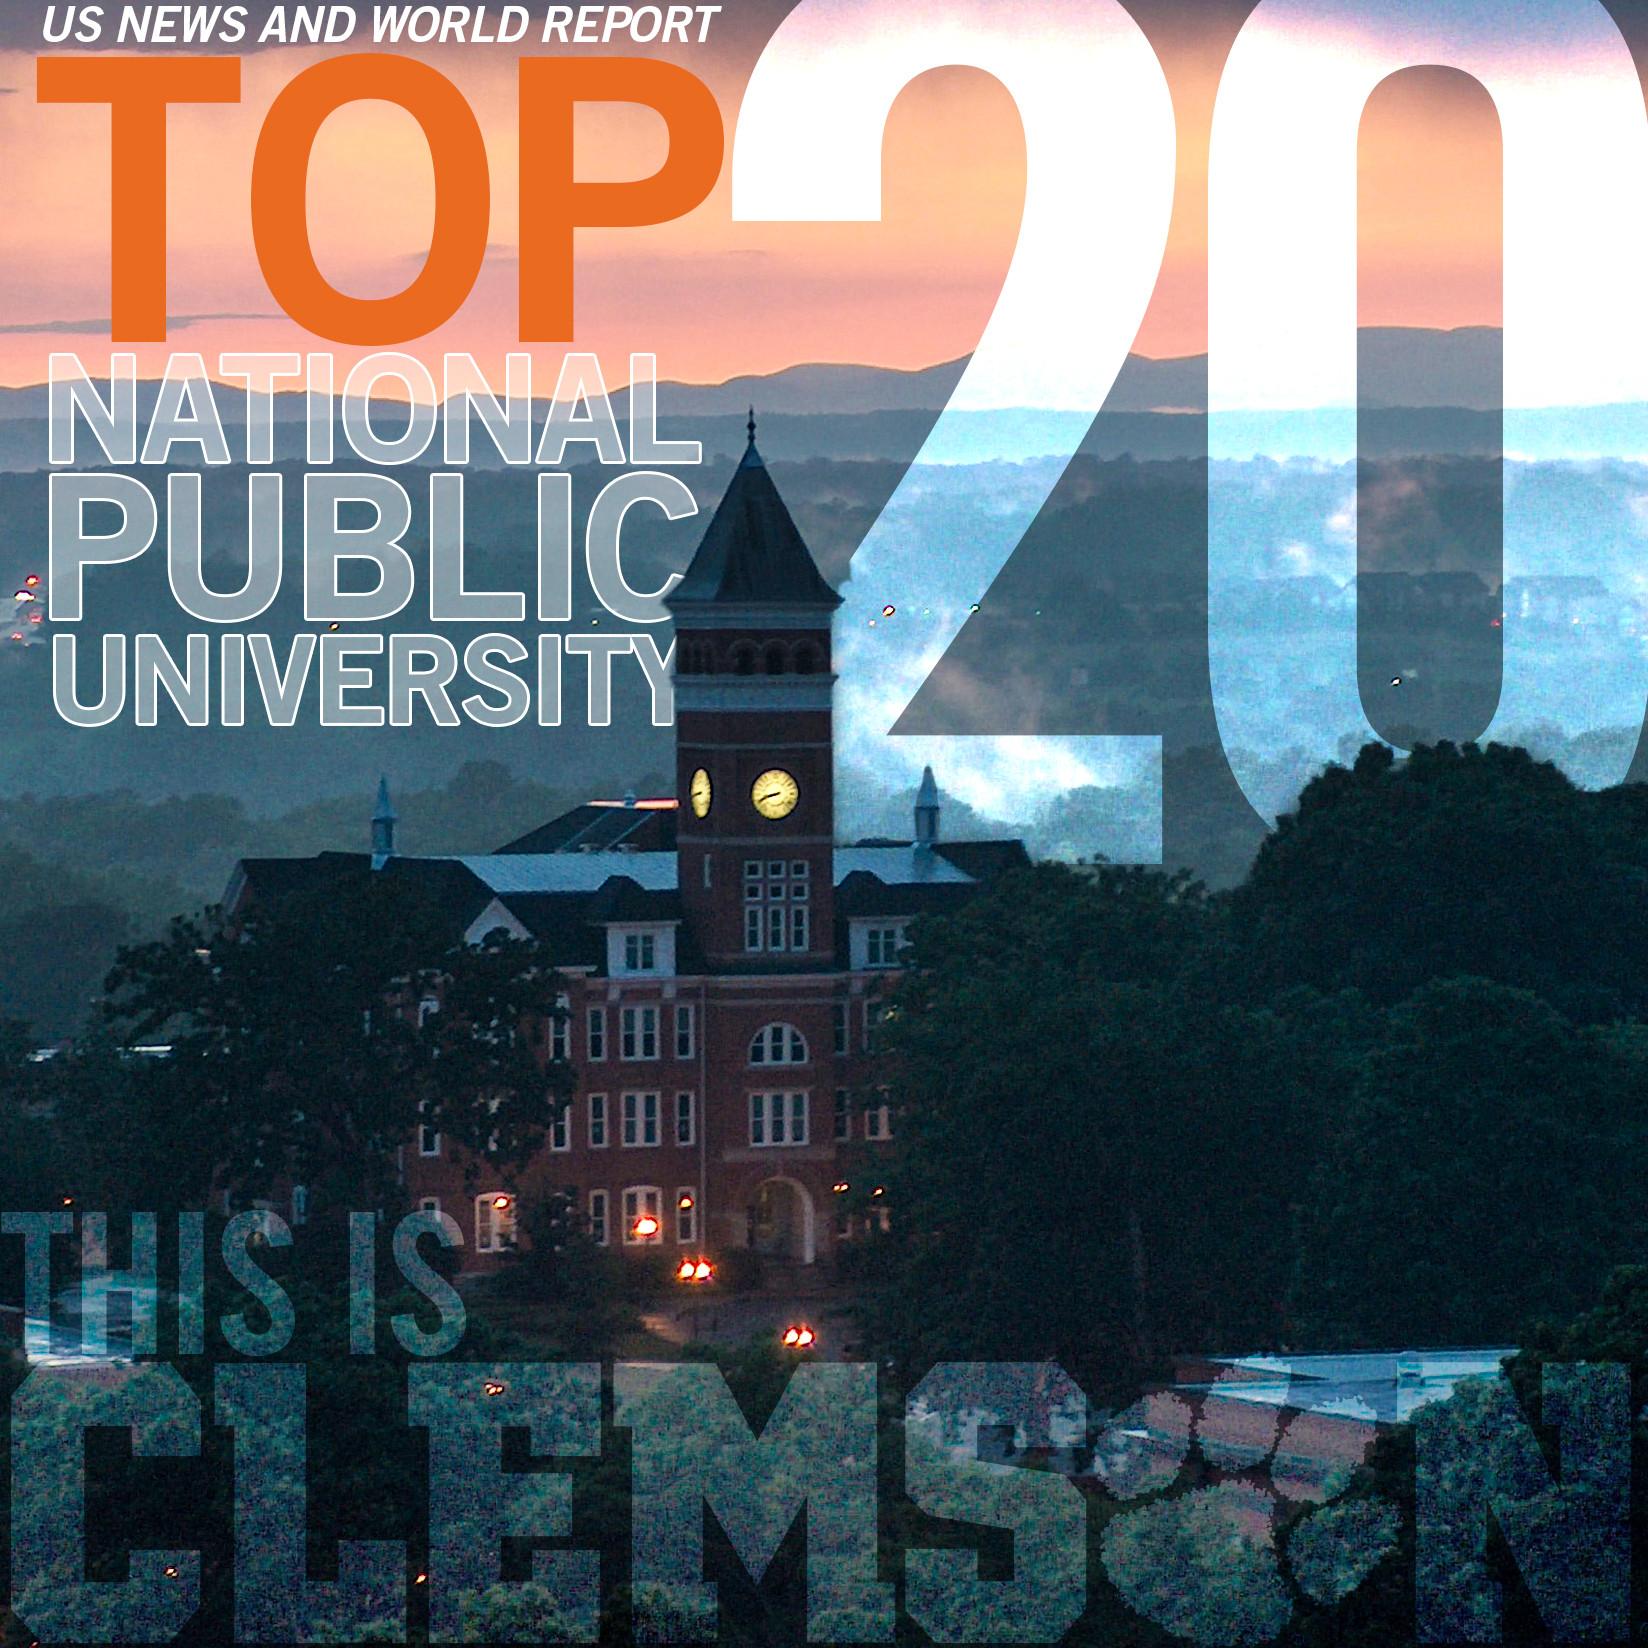 Clemson Achieves Top 20 Rank